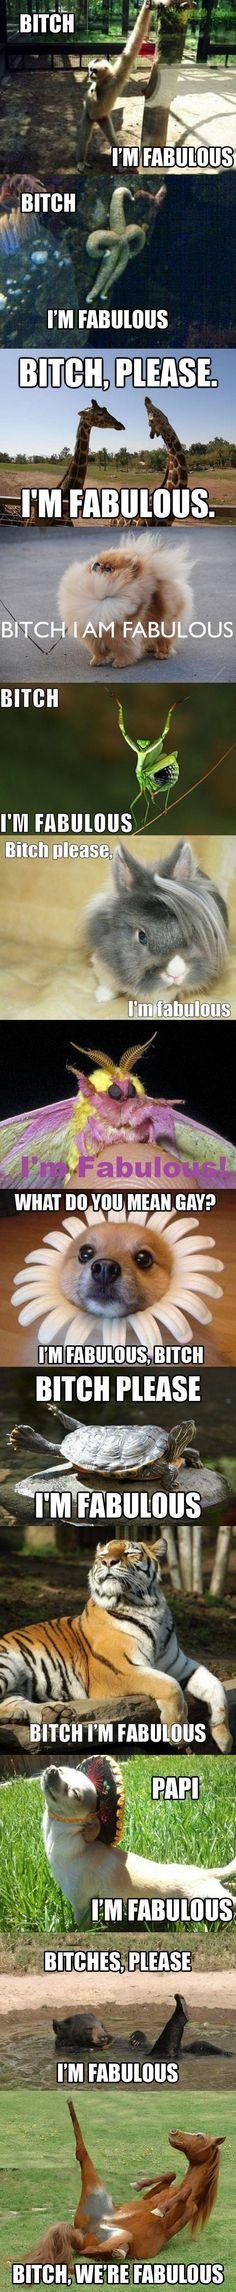 MEME - Fabulous animals - www.funny-pictures-blog.com